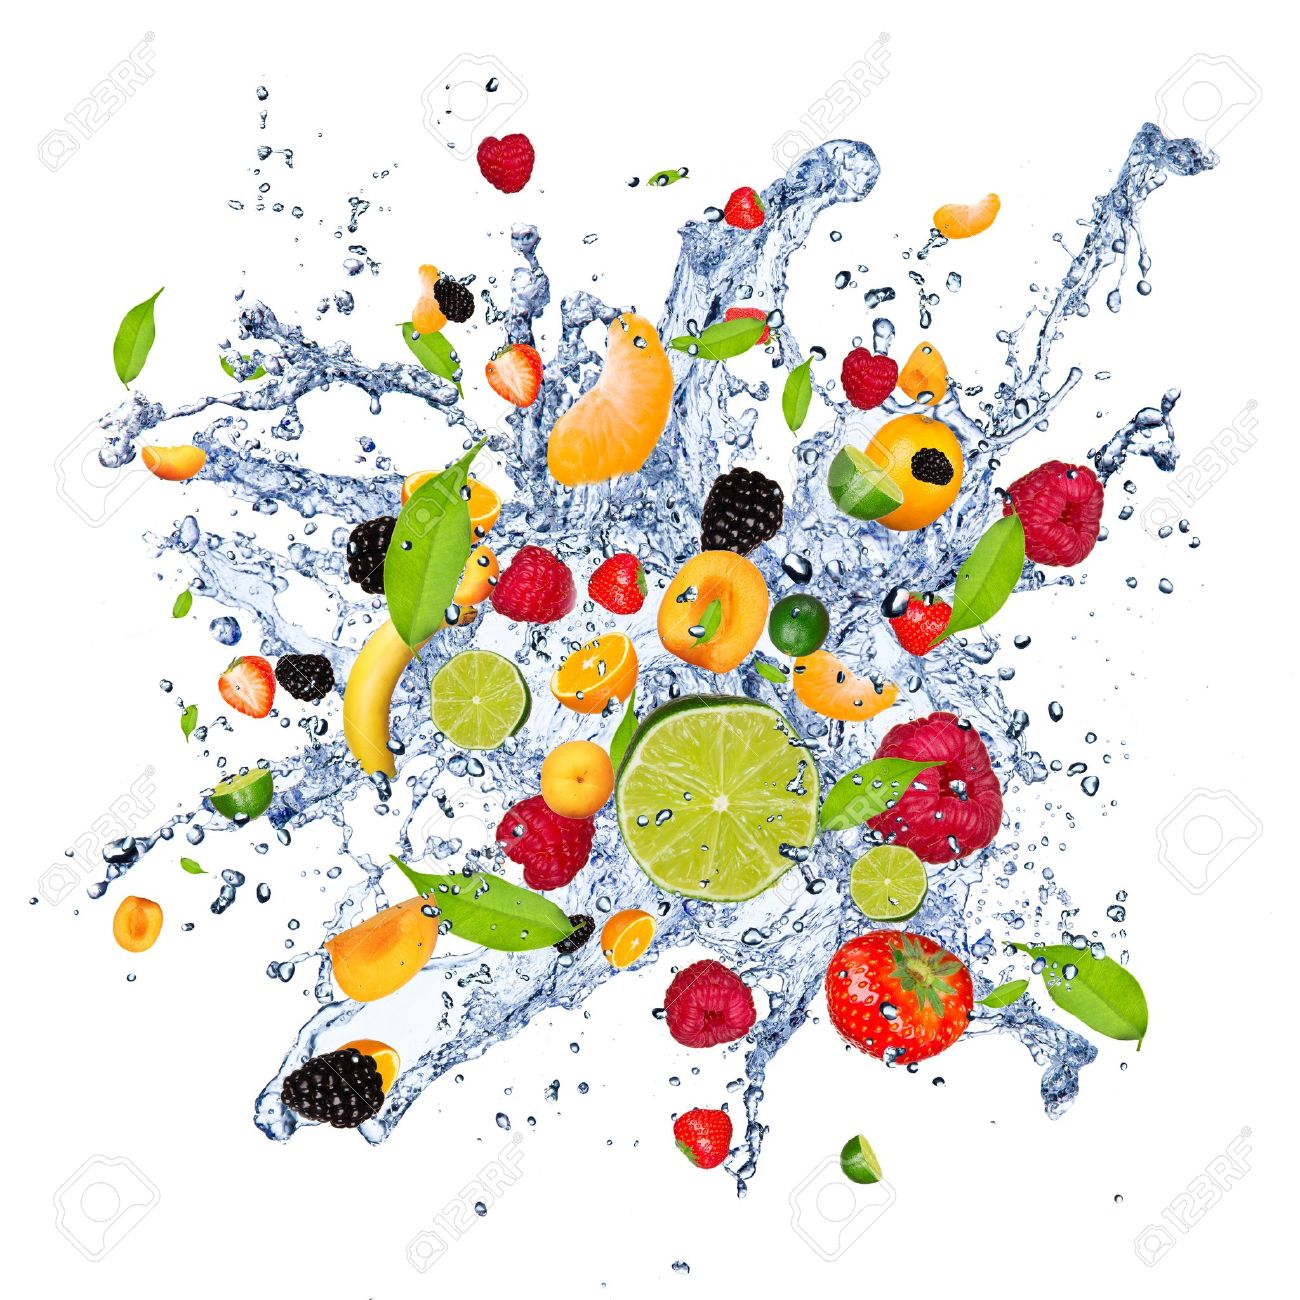 Fruit mix in water splash, isolated on white background Stock Photo -  13551982 - Fruit Water Splash PNG